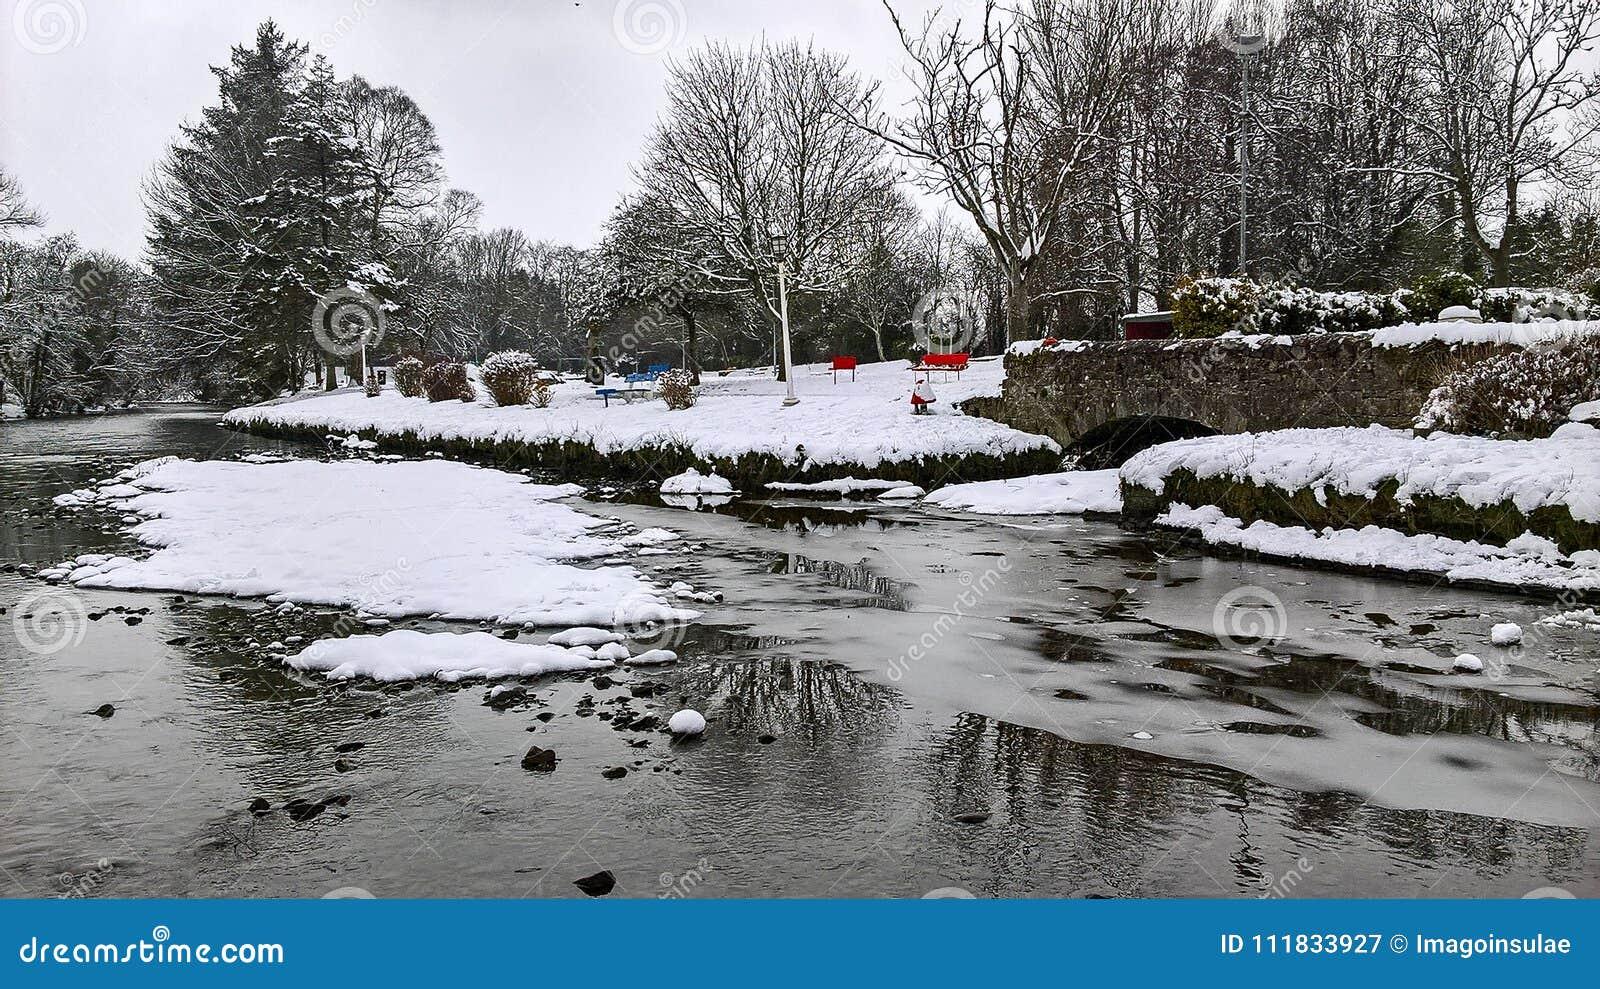 Season. Winter. Landscapes of water